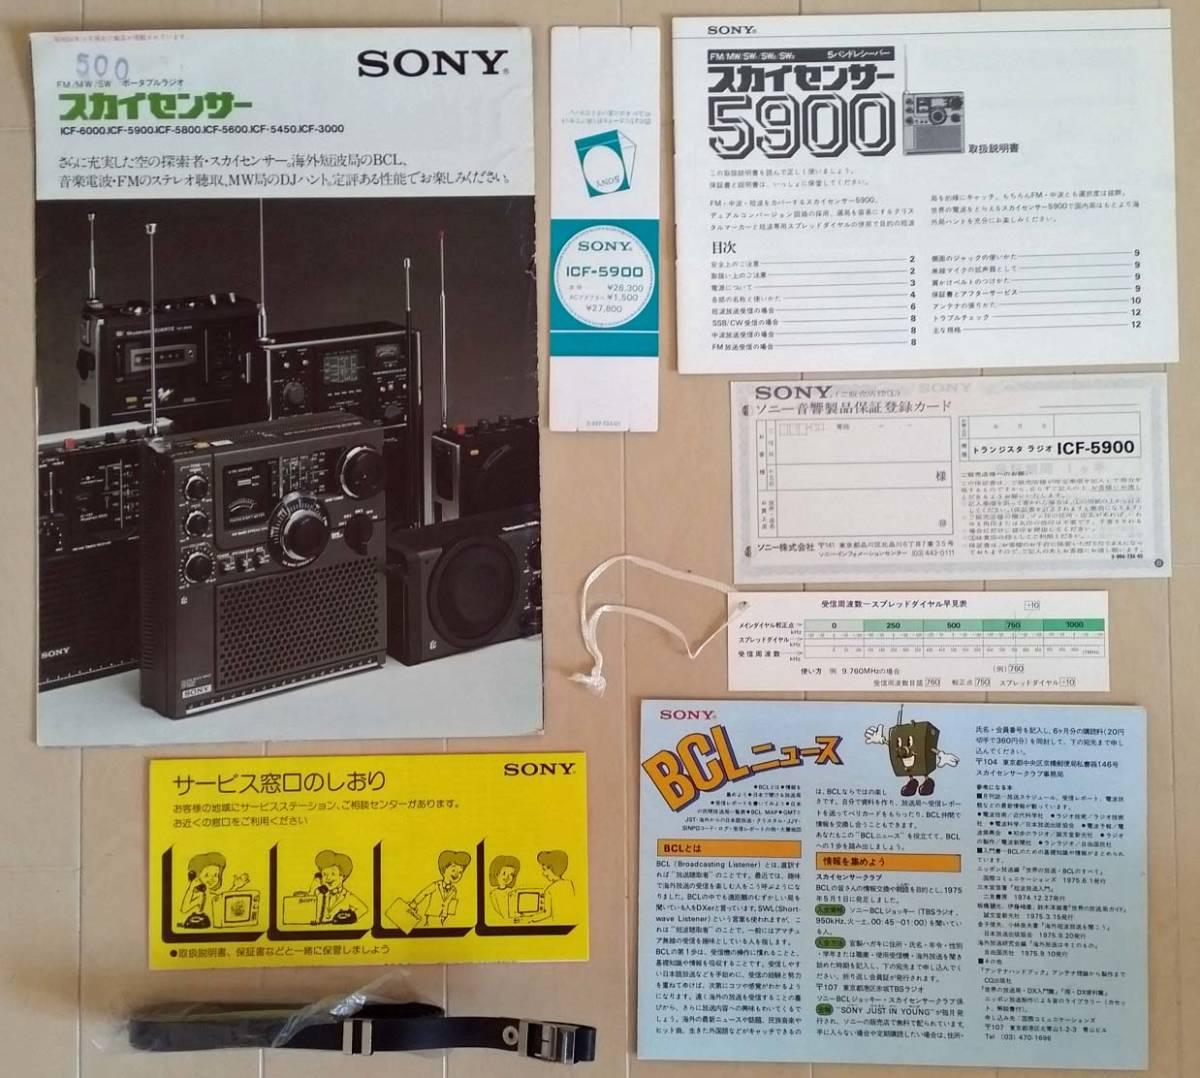 SONY スカイセンサー ICF-5900 MW・FM可動 取扱説明書・カタログ・キャリリングベルトあり